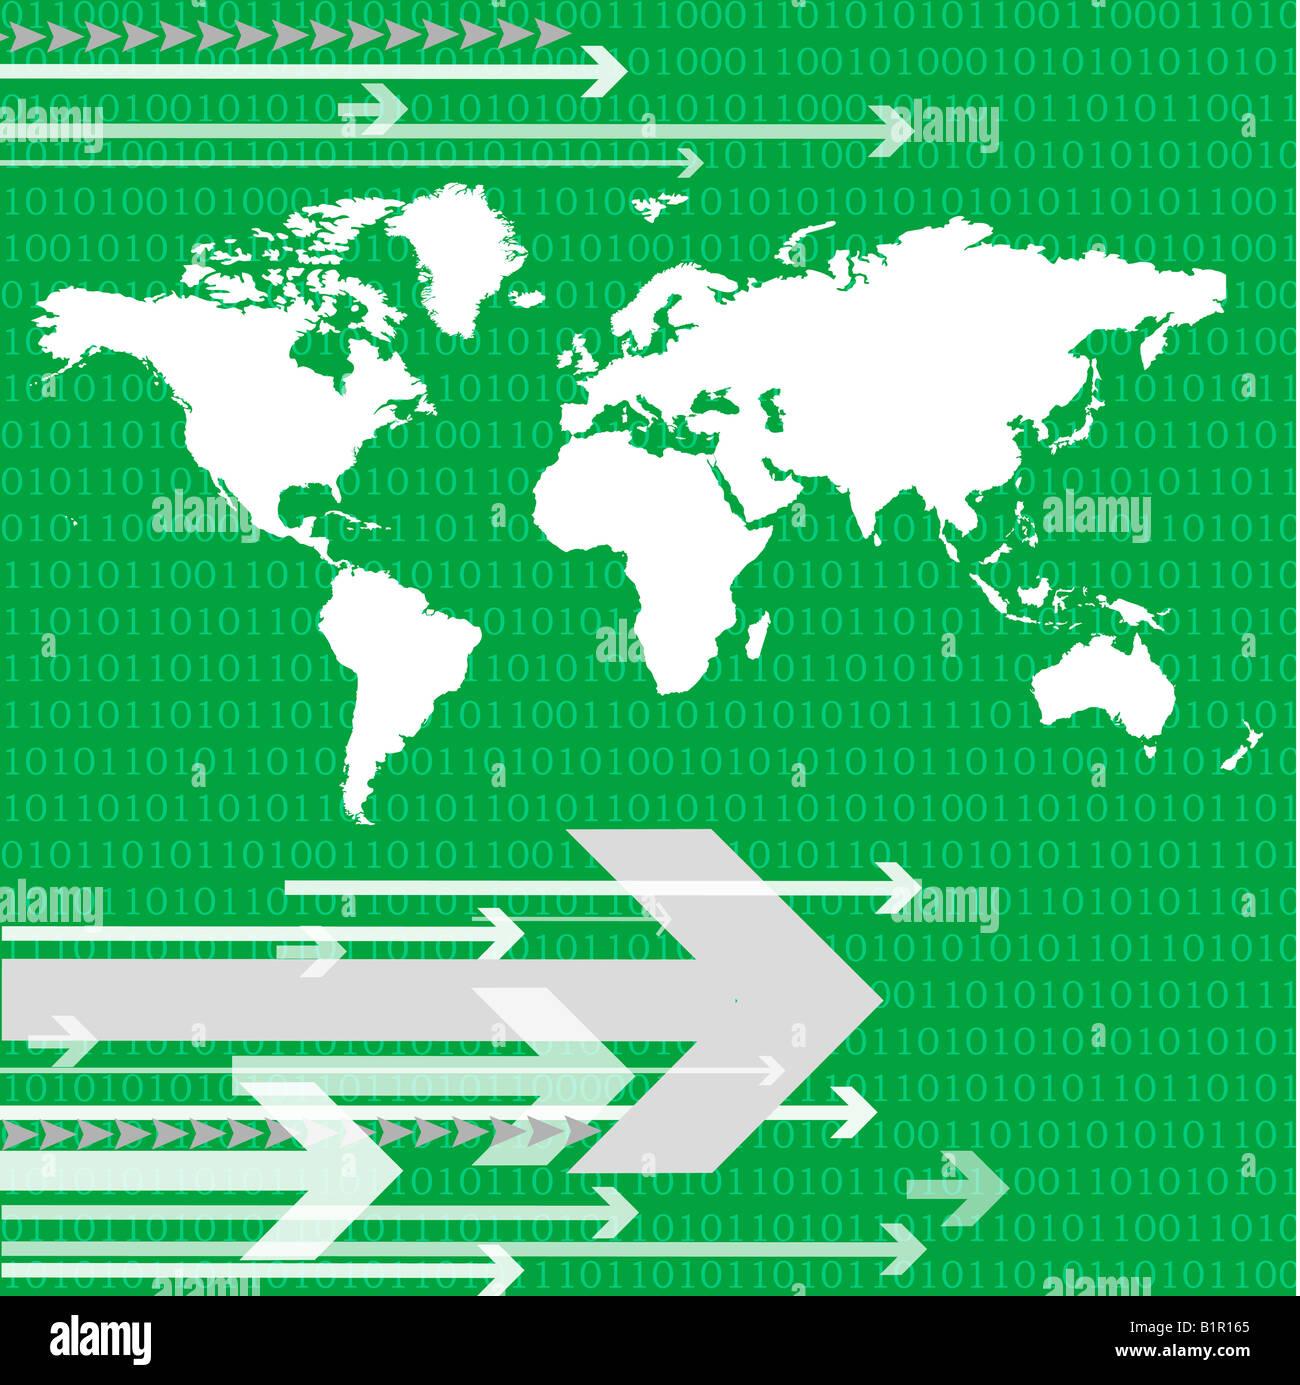 Weltkarte mit Pfeilen Stockbild